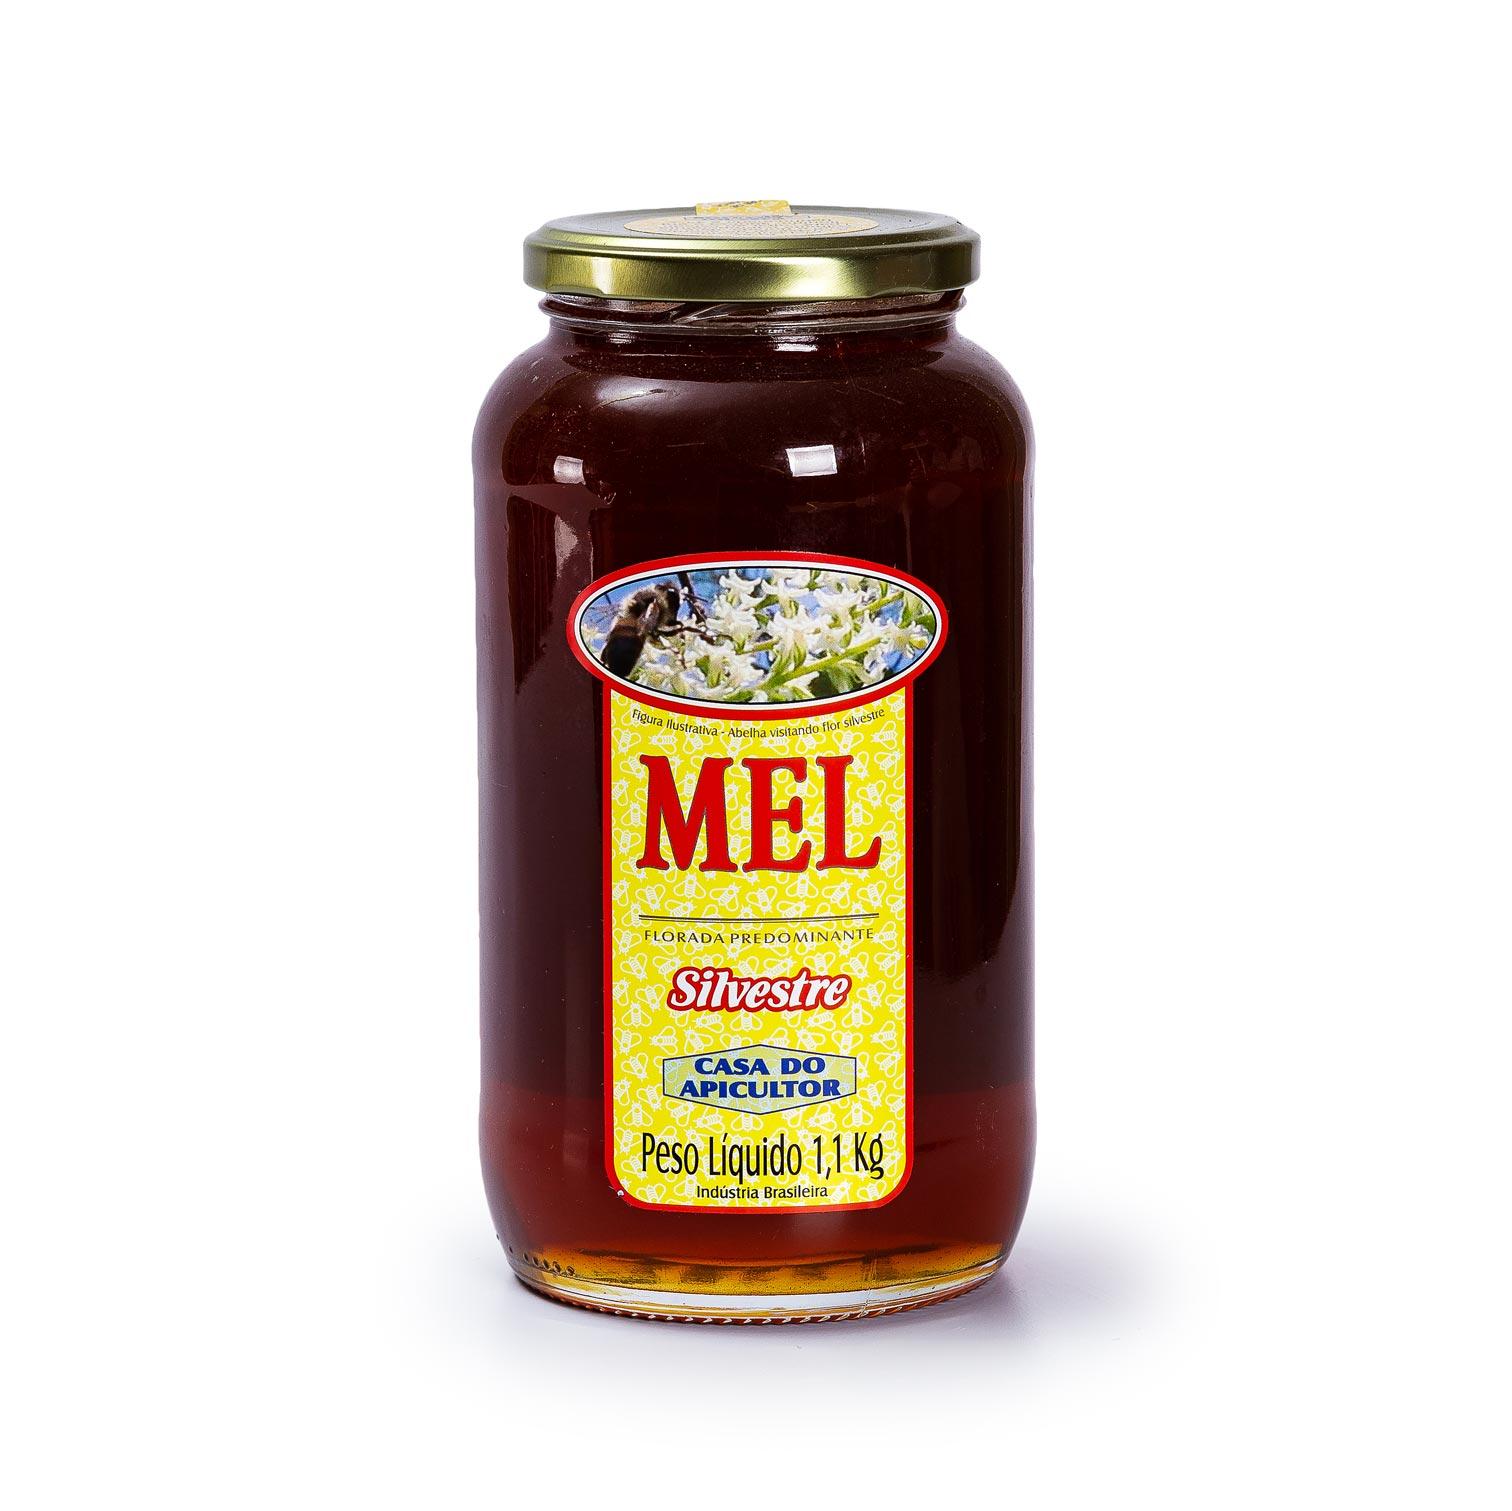 Mel Silvestre 1,1Kg - Casa do Apicultor